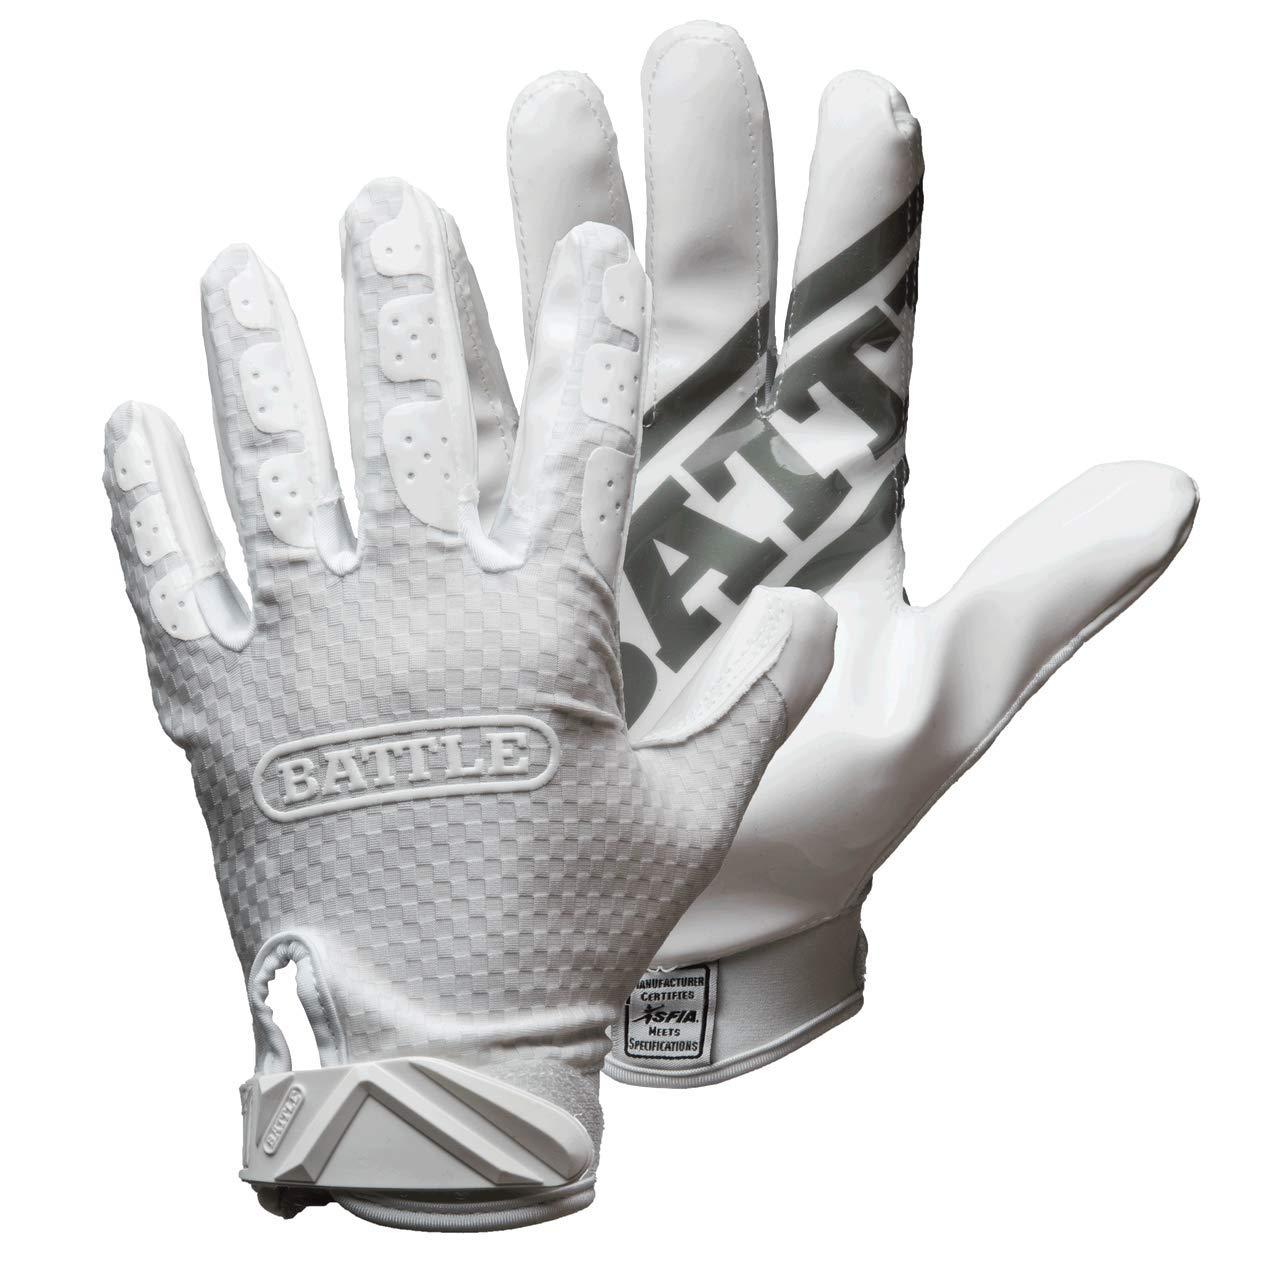 Battle Triple Threat Adult Receiver Gloves - Size Triple Threat Adult Receiver Gloves, White, Small